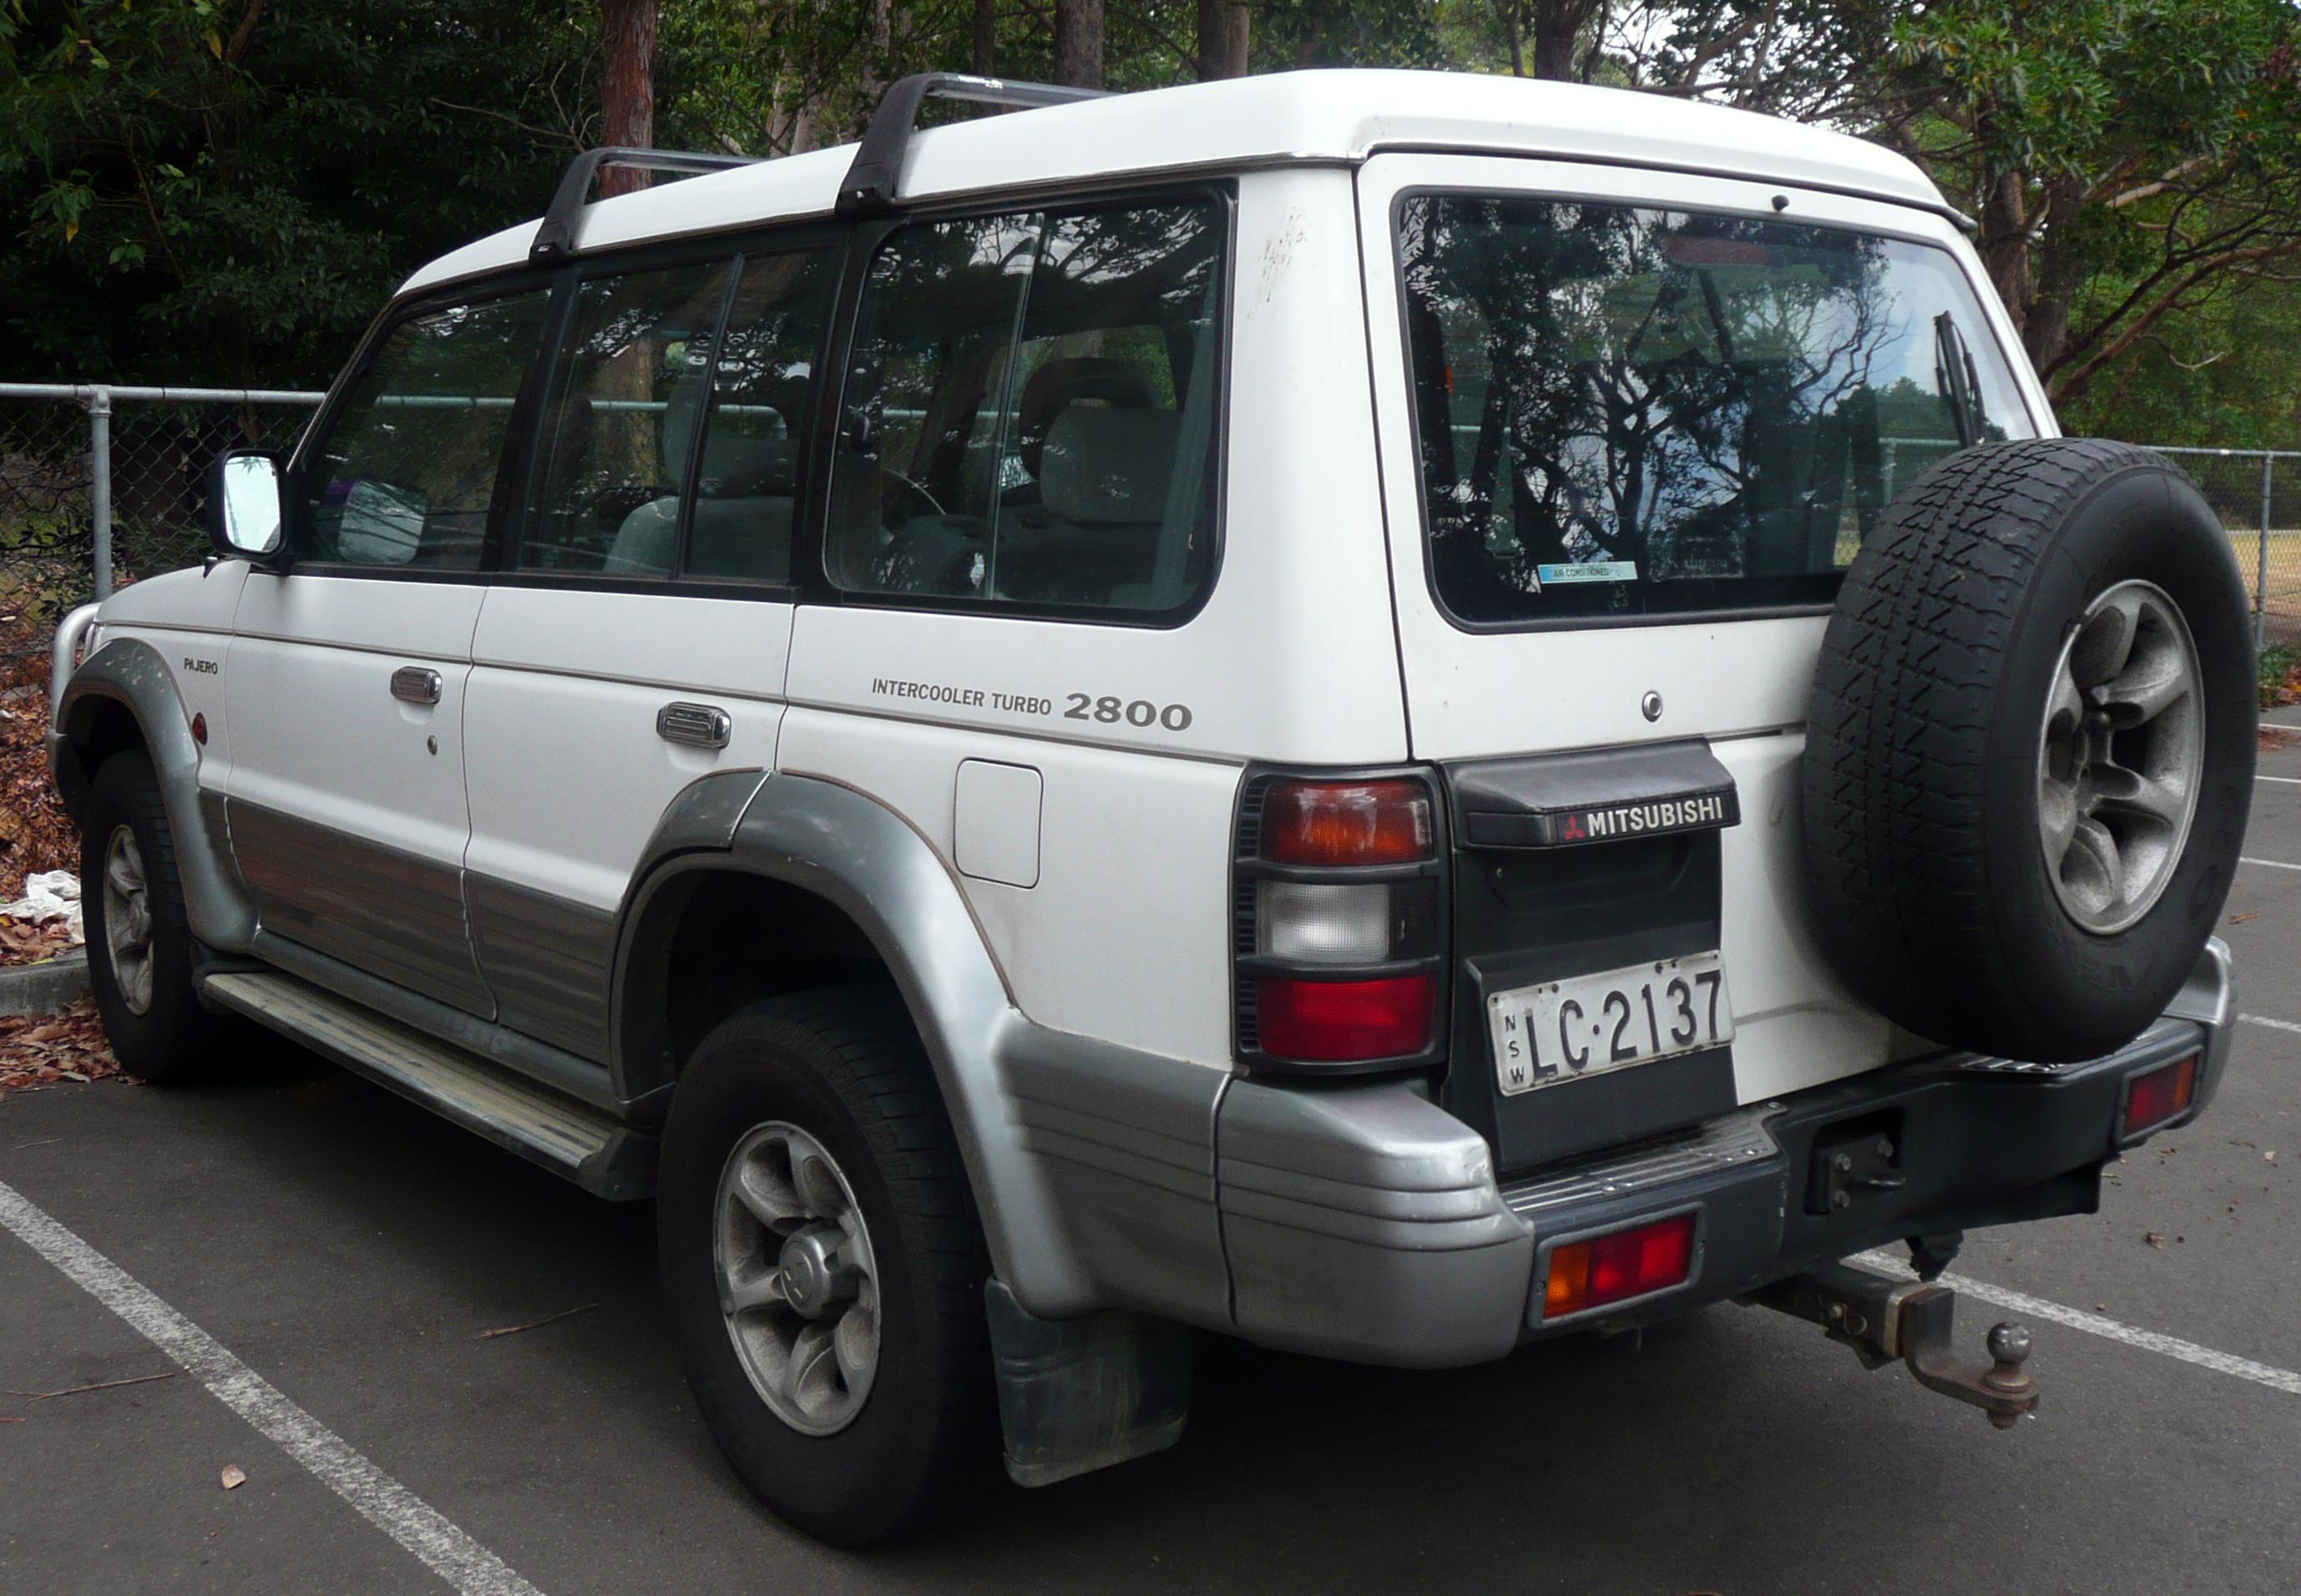 Description 1993 1996 mitsubishi pajero nj gls wagon 01